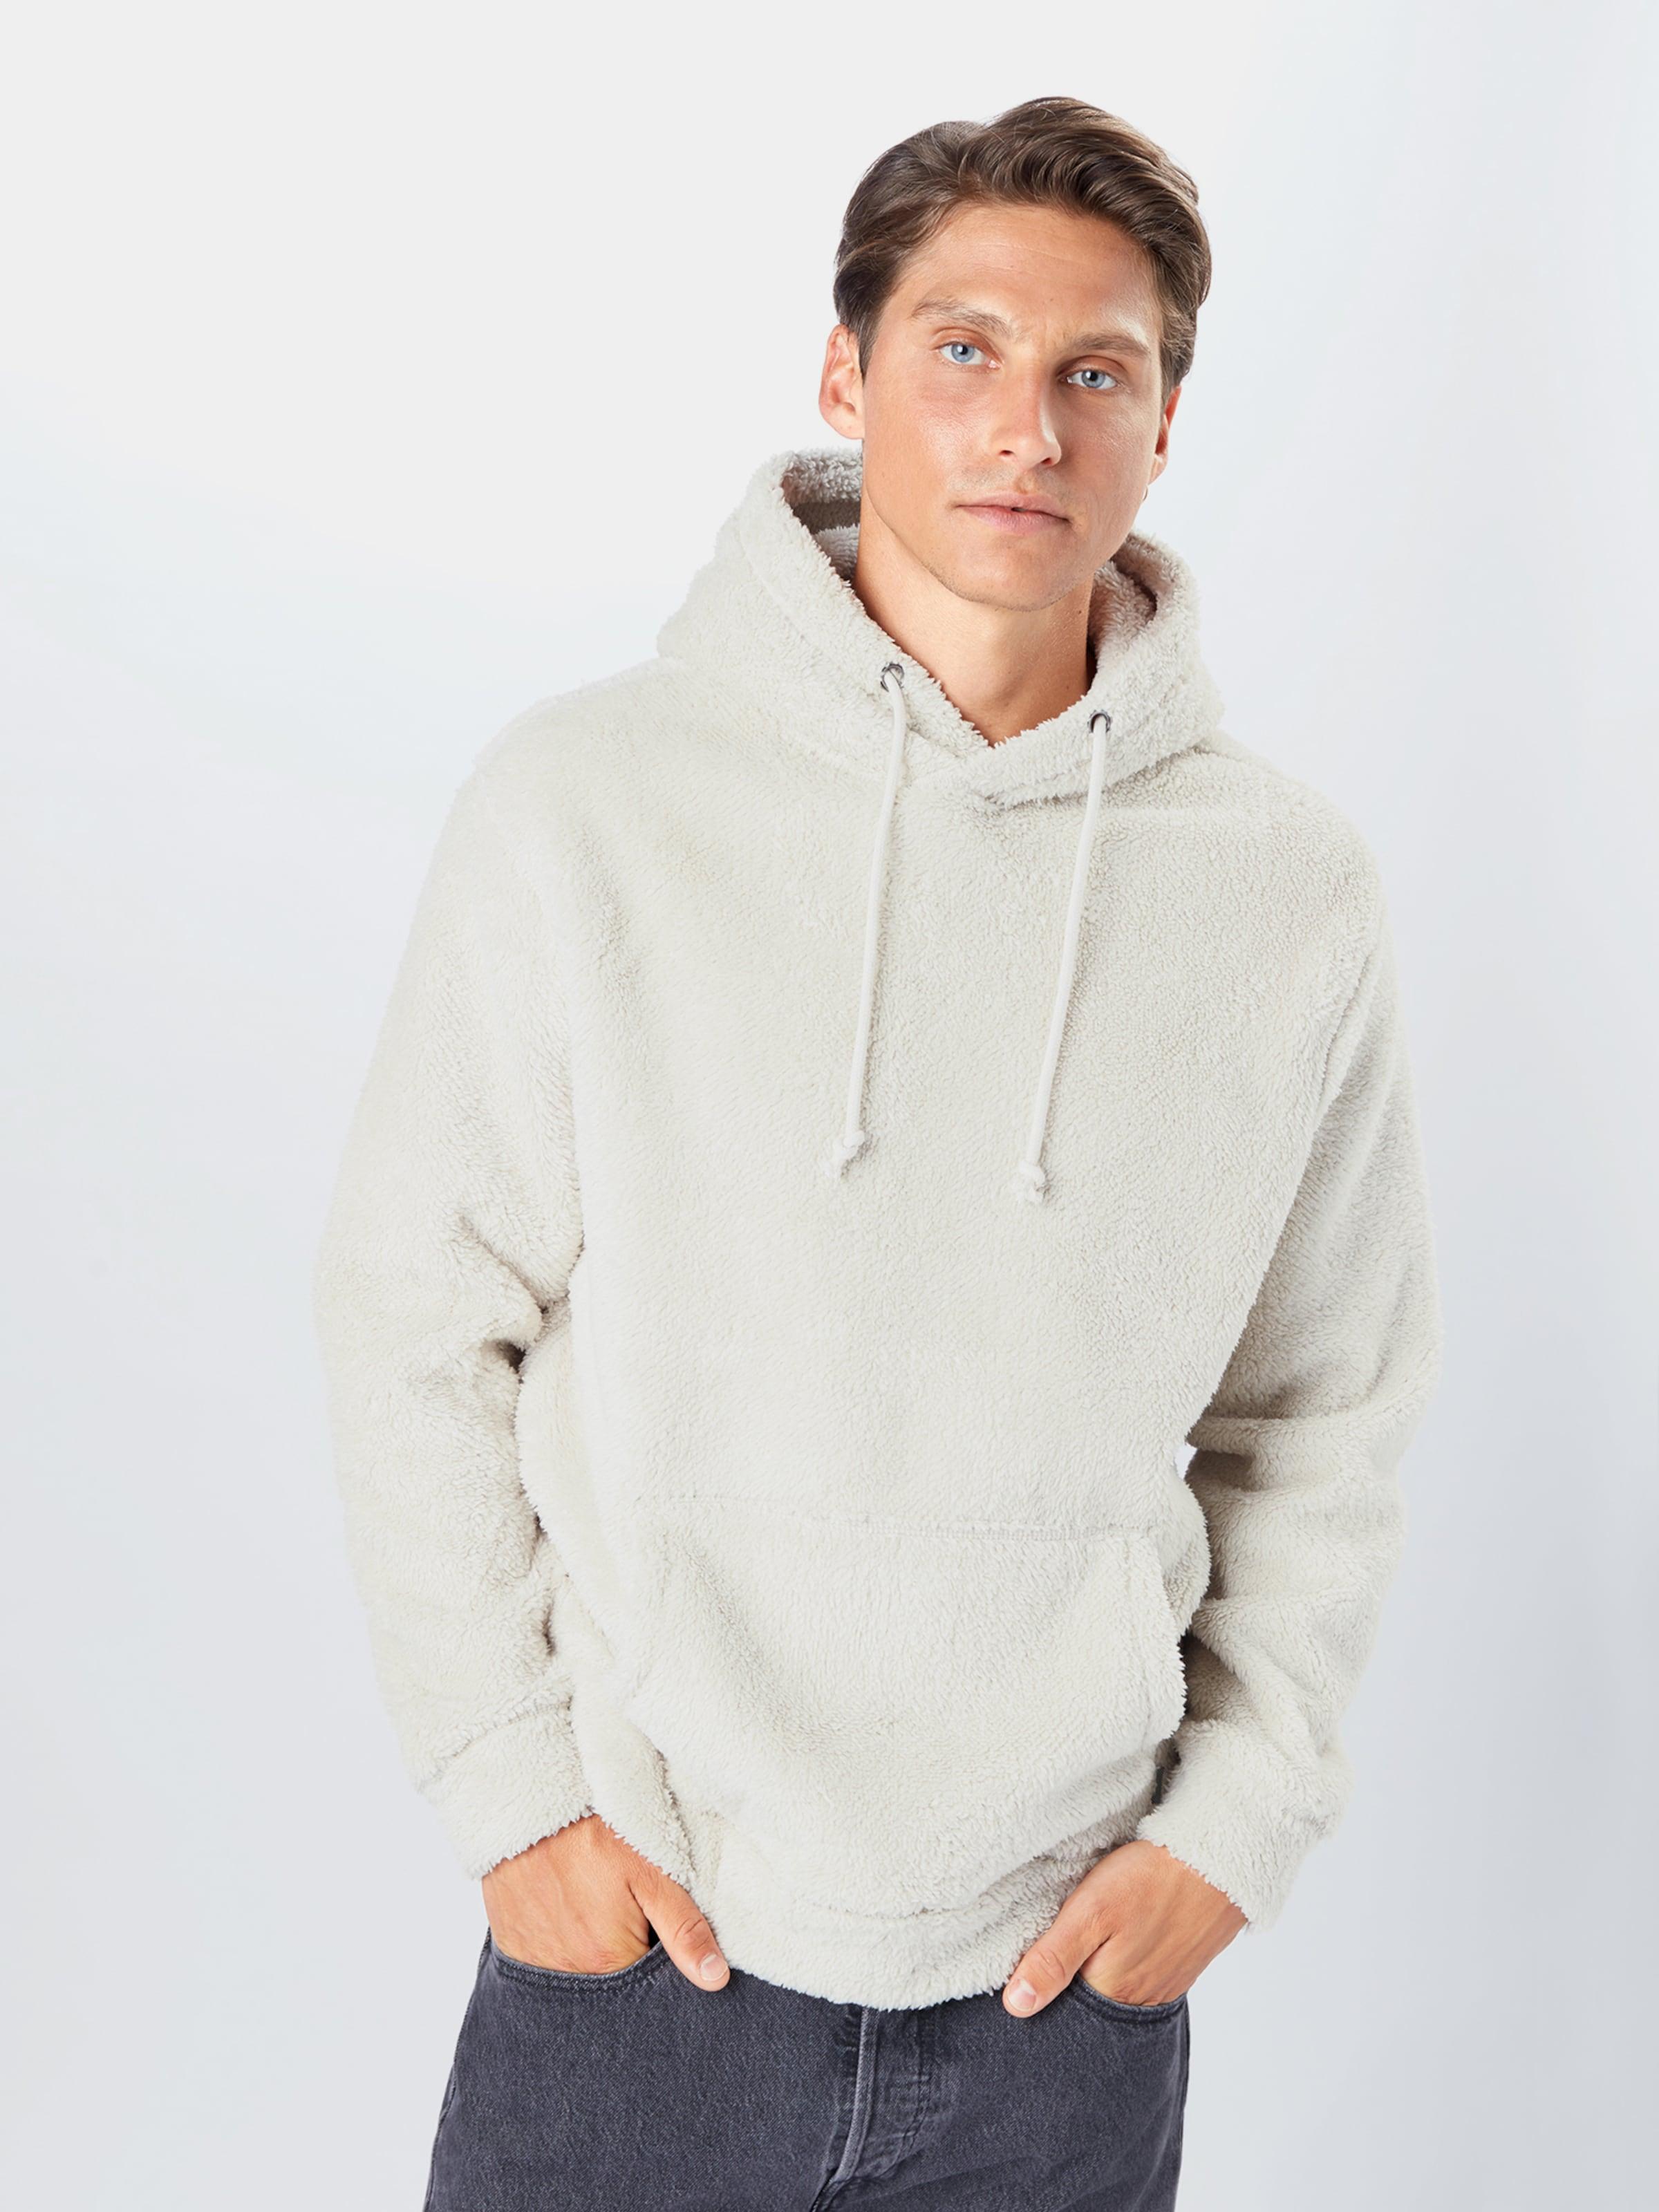 !Solid Sweatshirt  'Manas' in weiß Sweatstoff SLD0498001000001